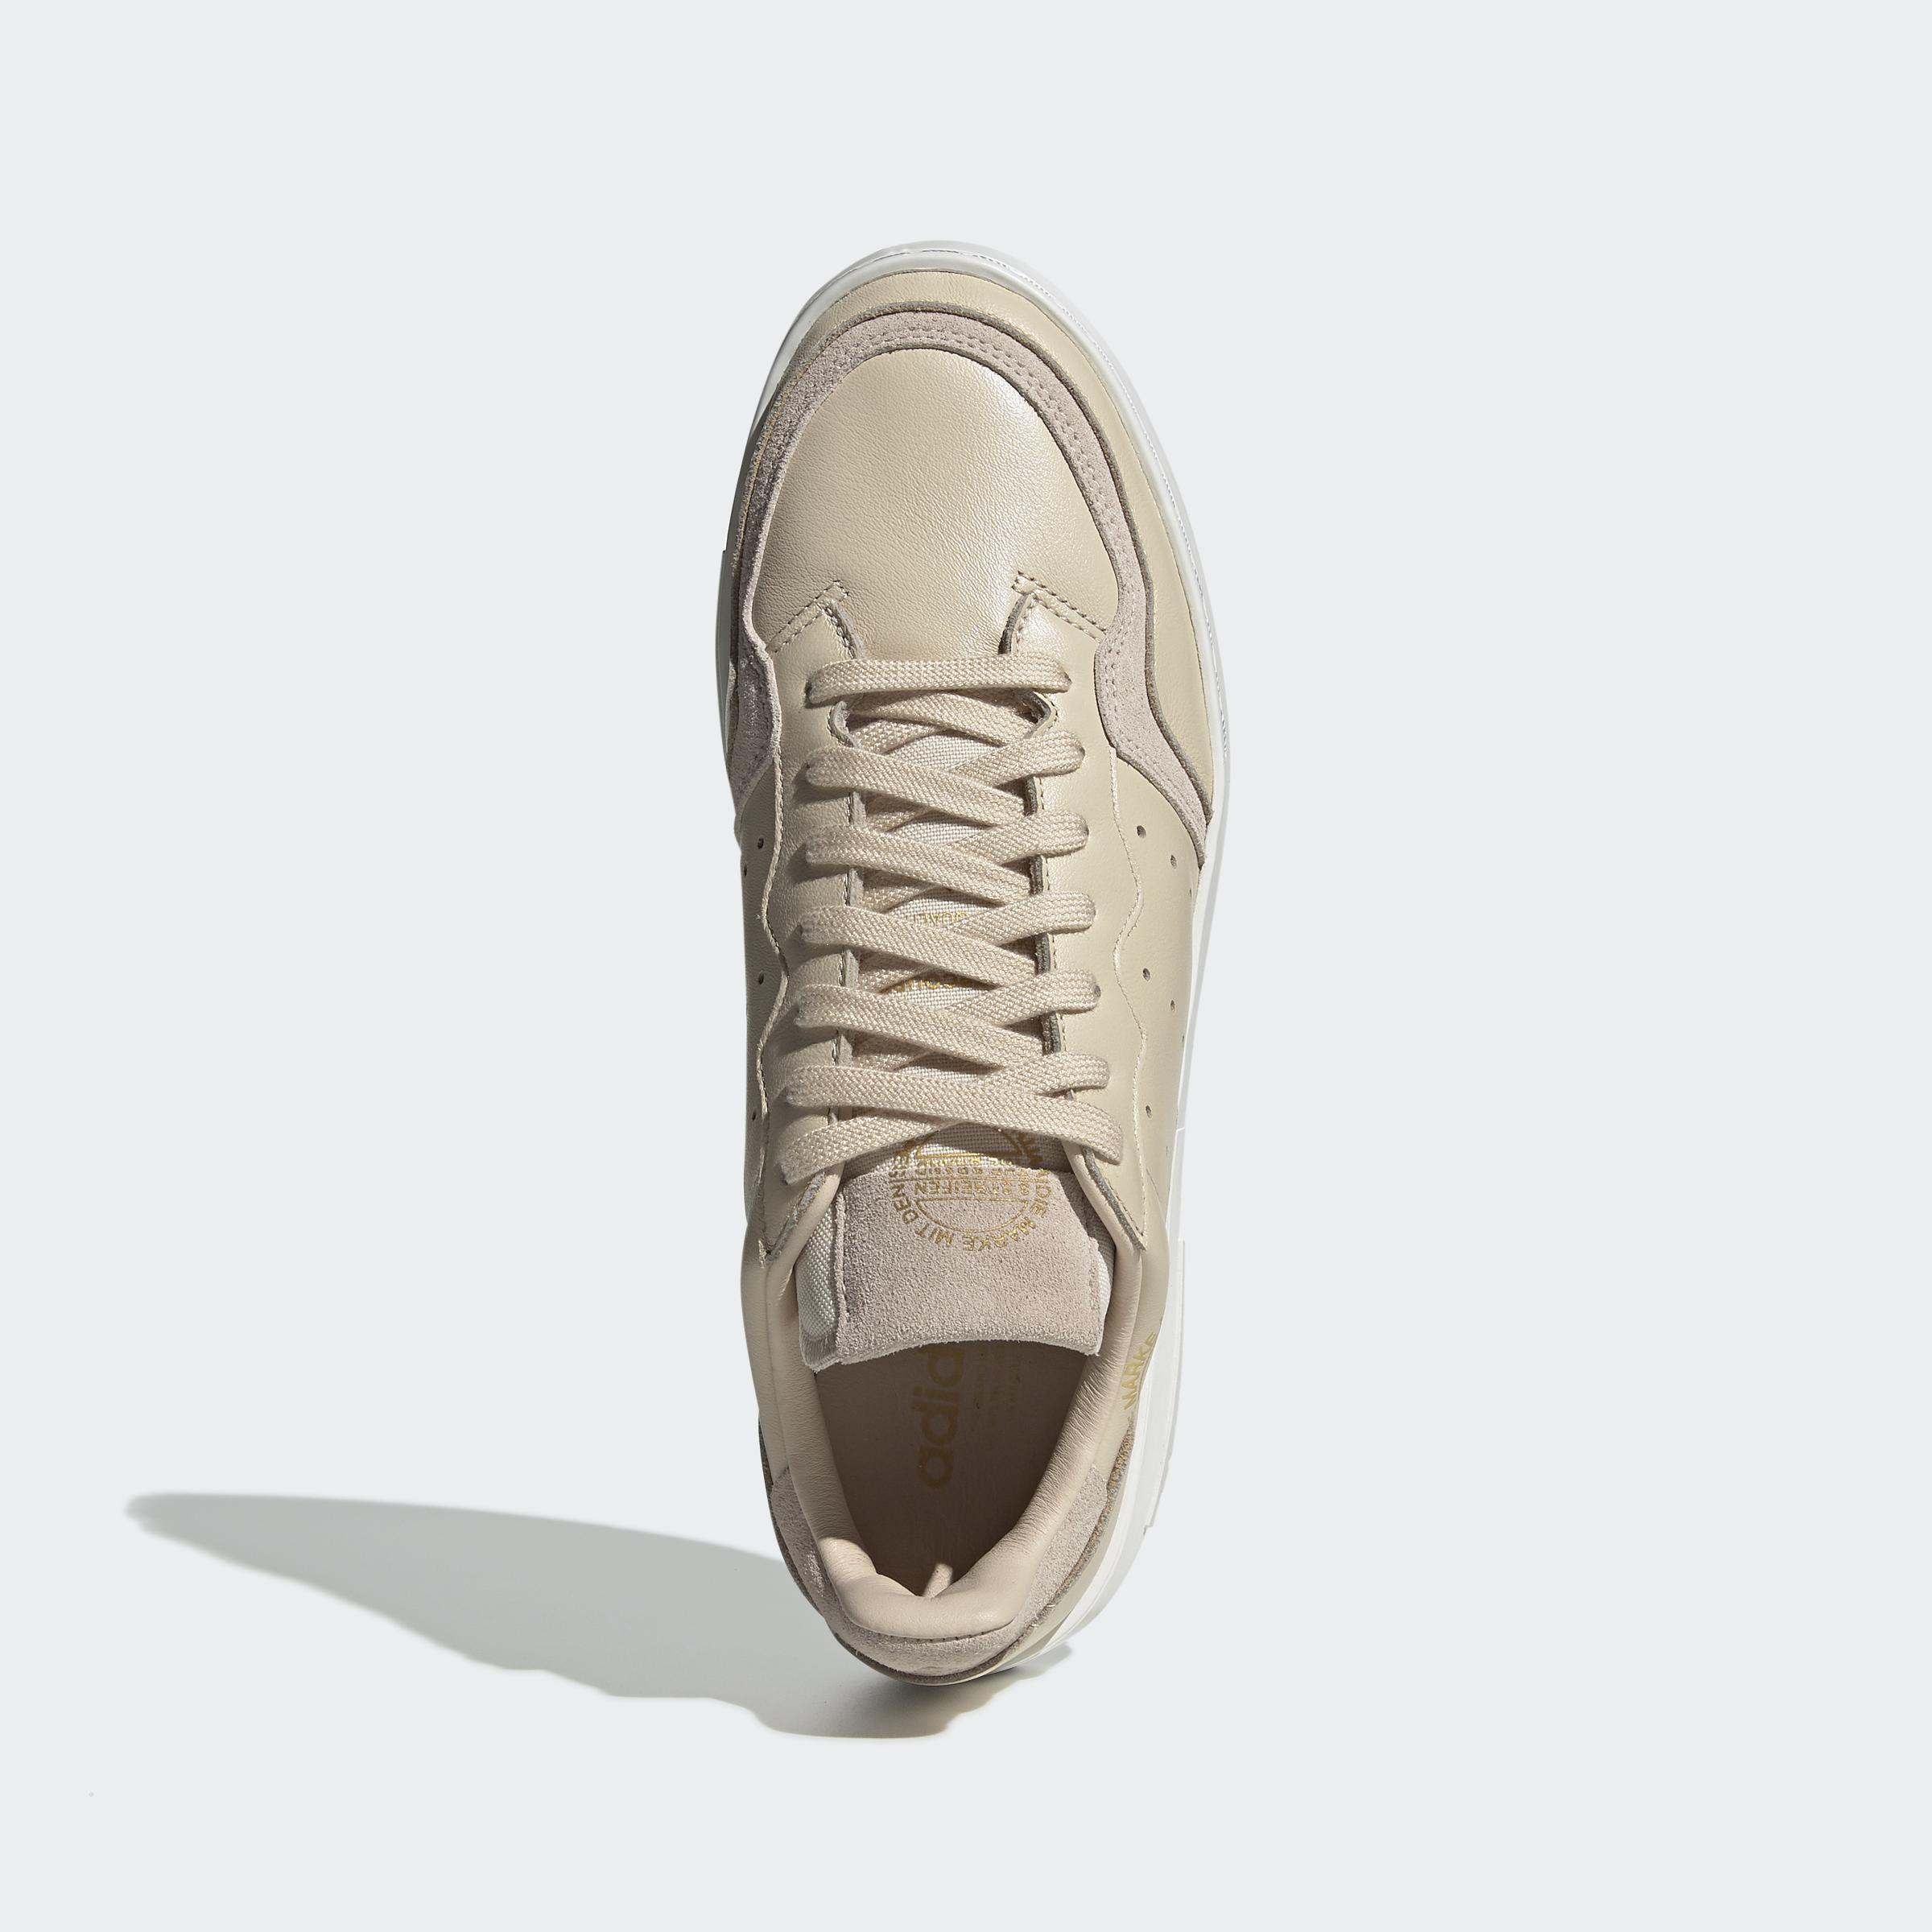 Indexbild 5 - adidas Originals Supercourt Schuh Herren, Damen Sneakers Turnschuhe  Freizeit